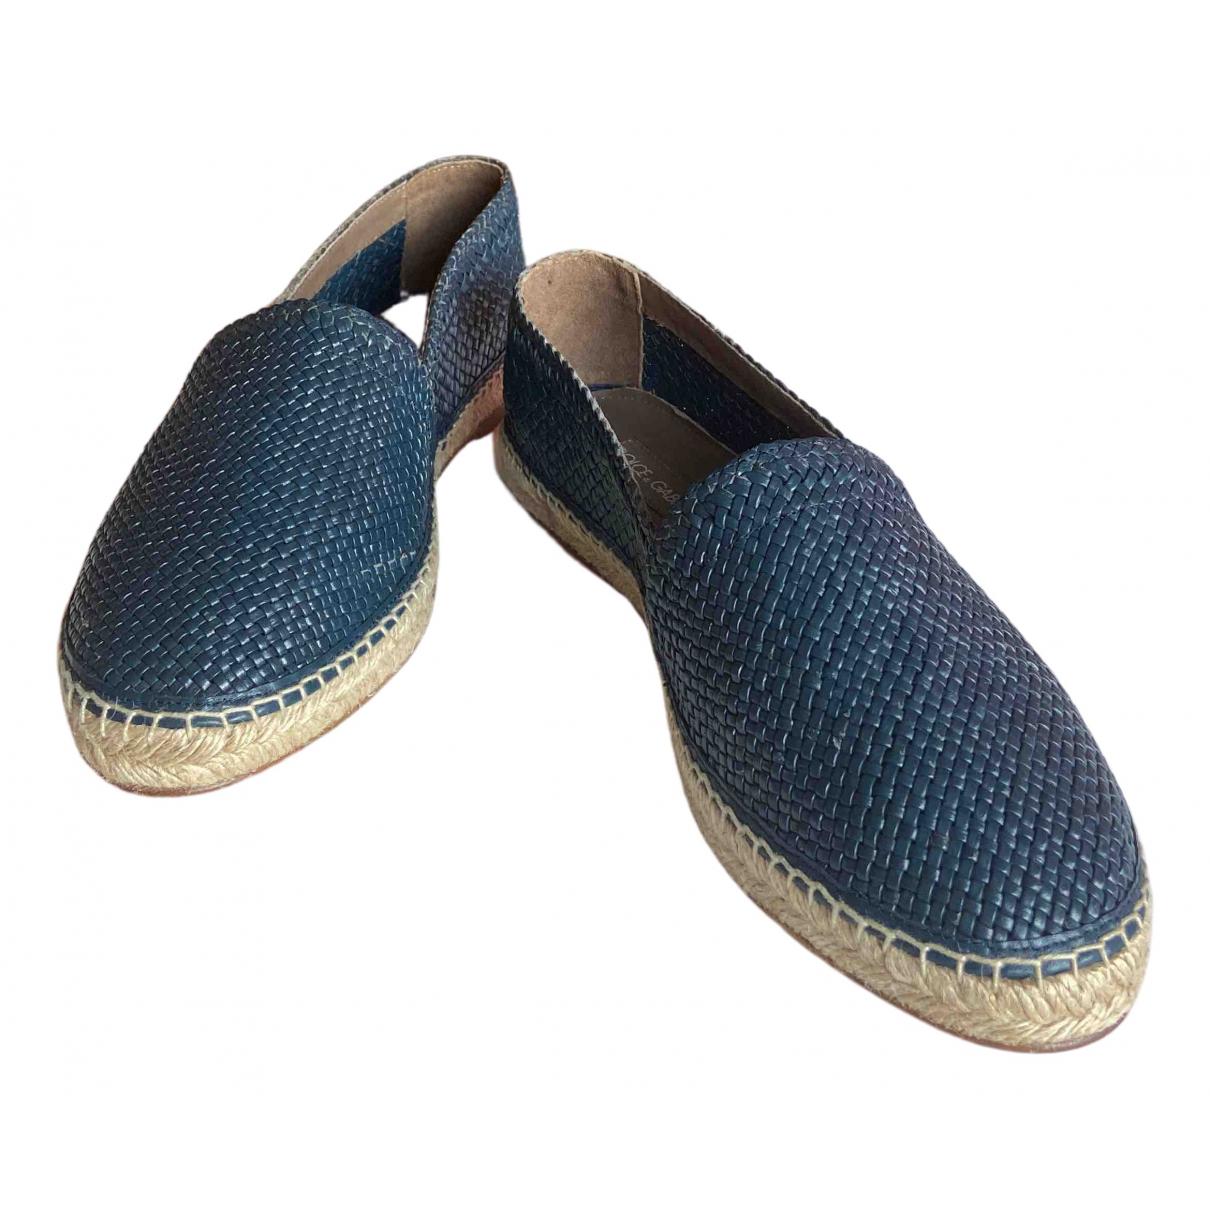 Dolce & Gabbana \N Blue Leather Espadrilles for Men 44 EU